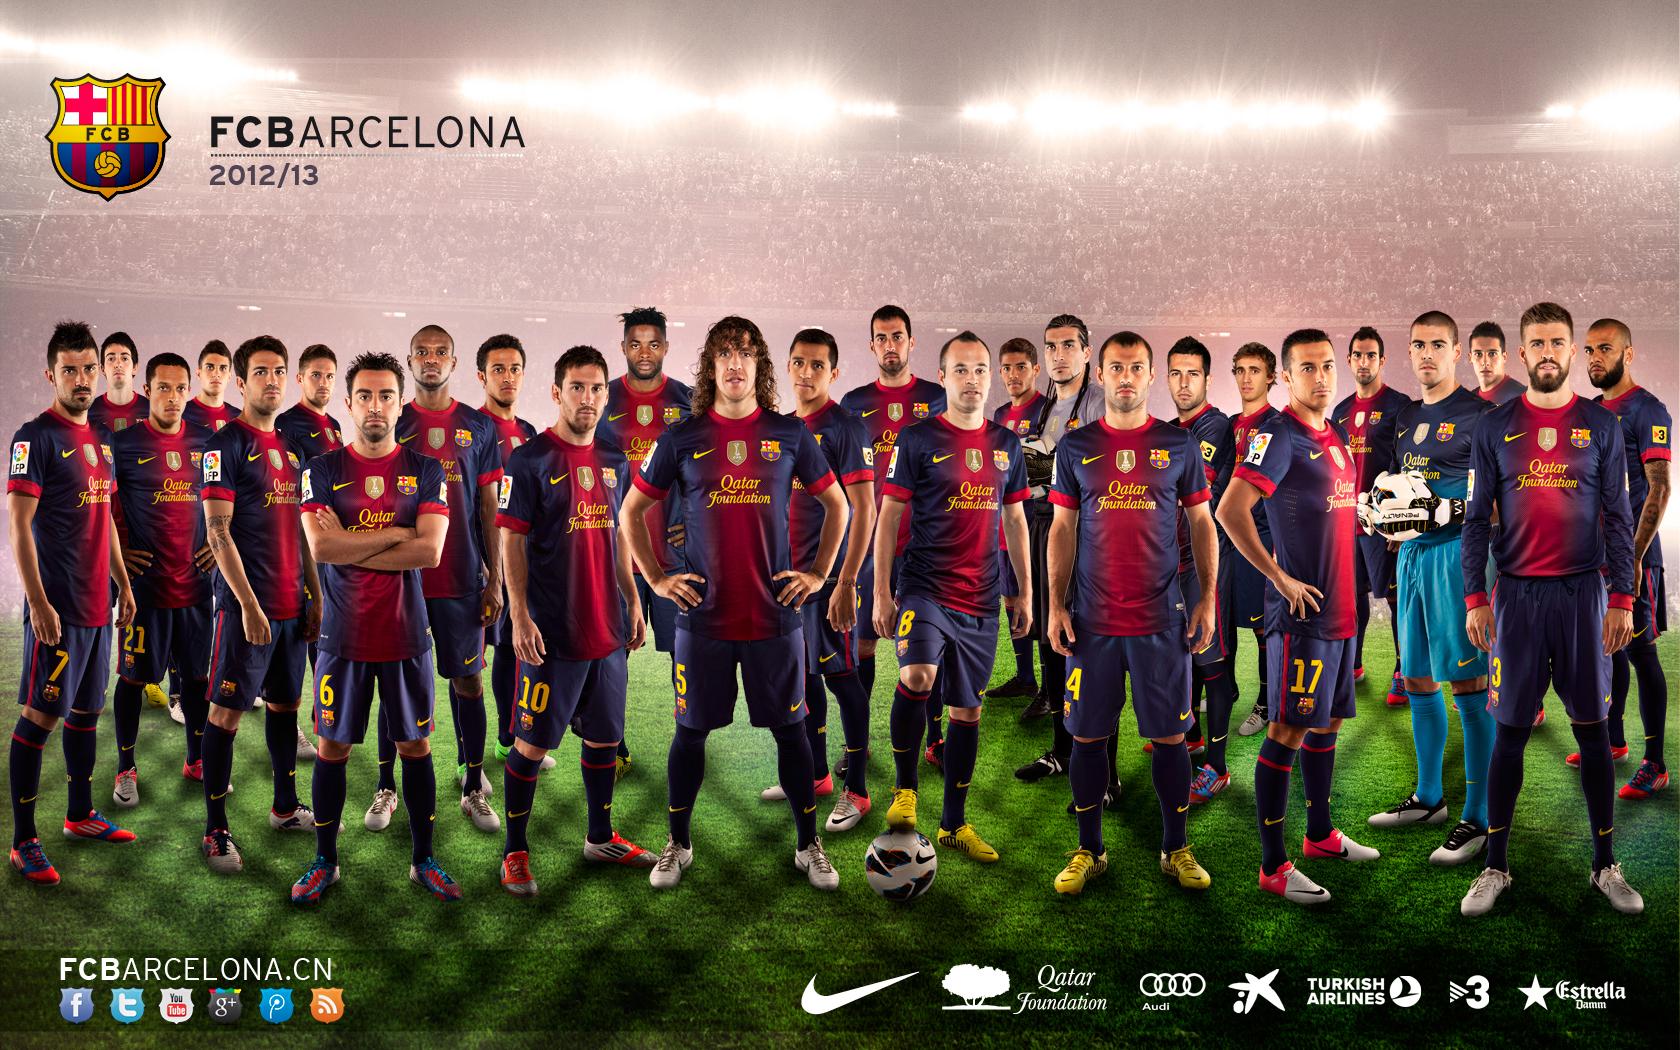 Leo Messi's Ballon d'Or wallpaper